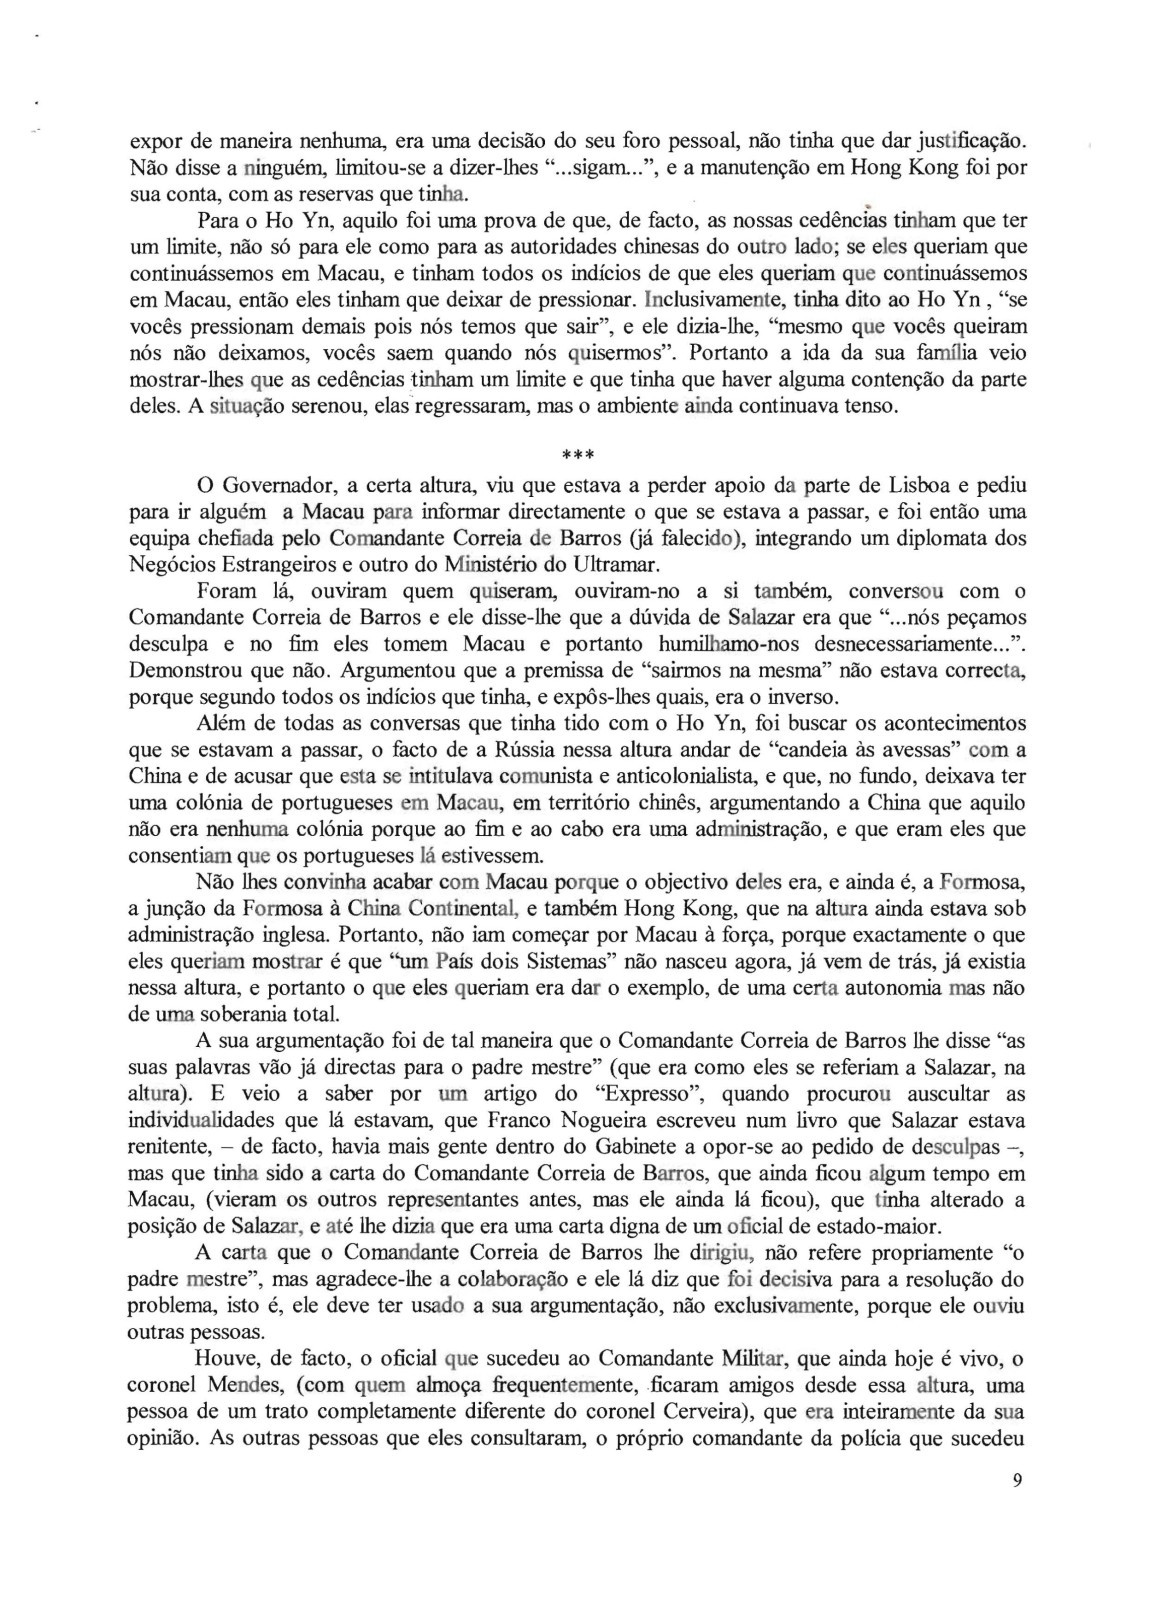 00474 01-03-28 Academia de Marinha-Entrevista do Alm Nunes da Silva pg 9 de 12